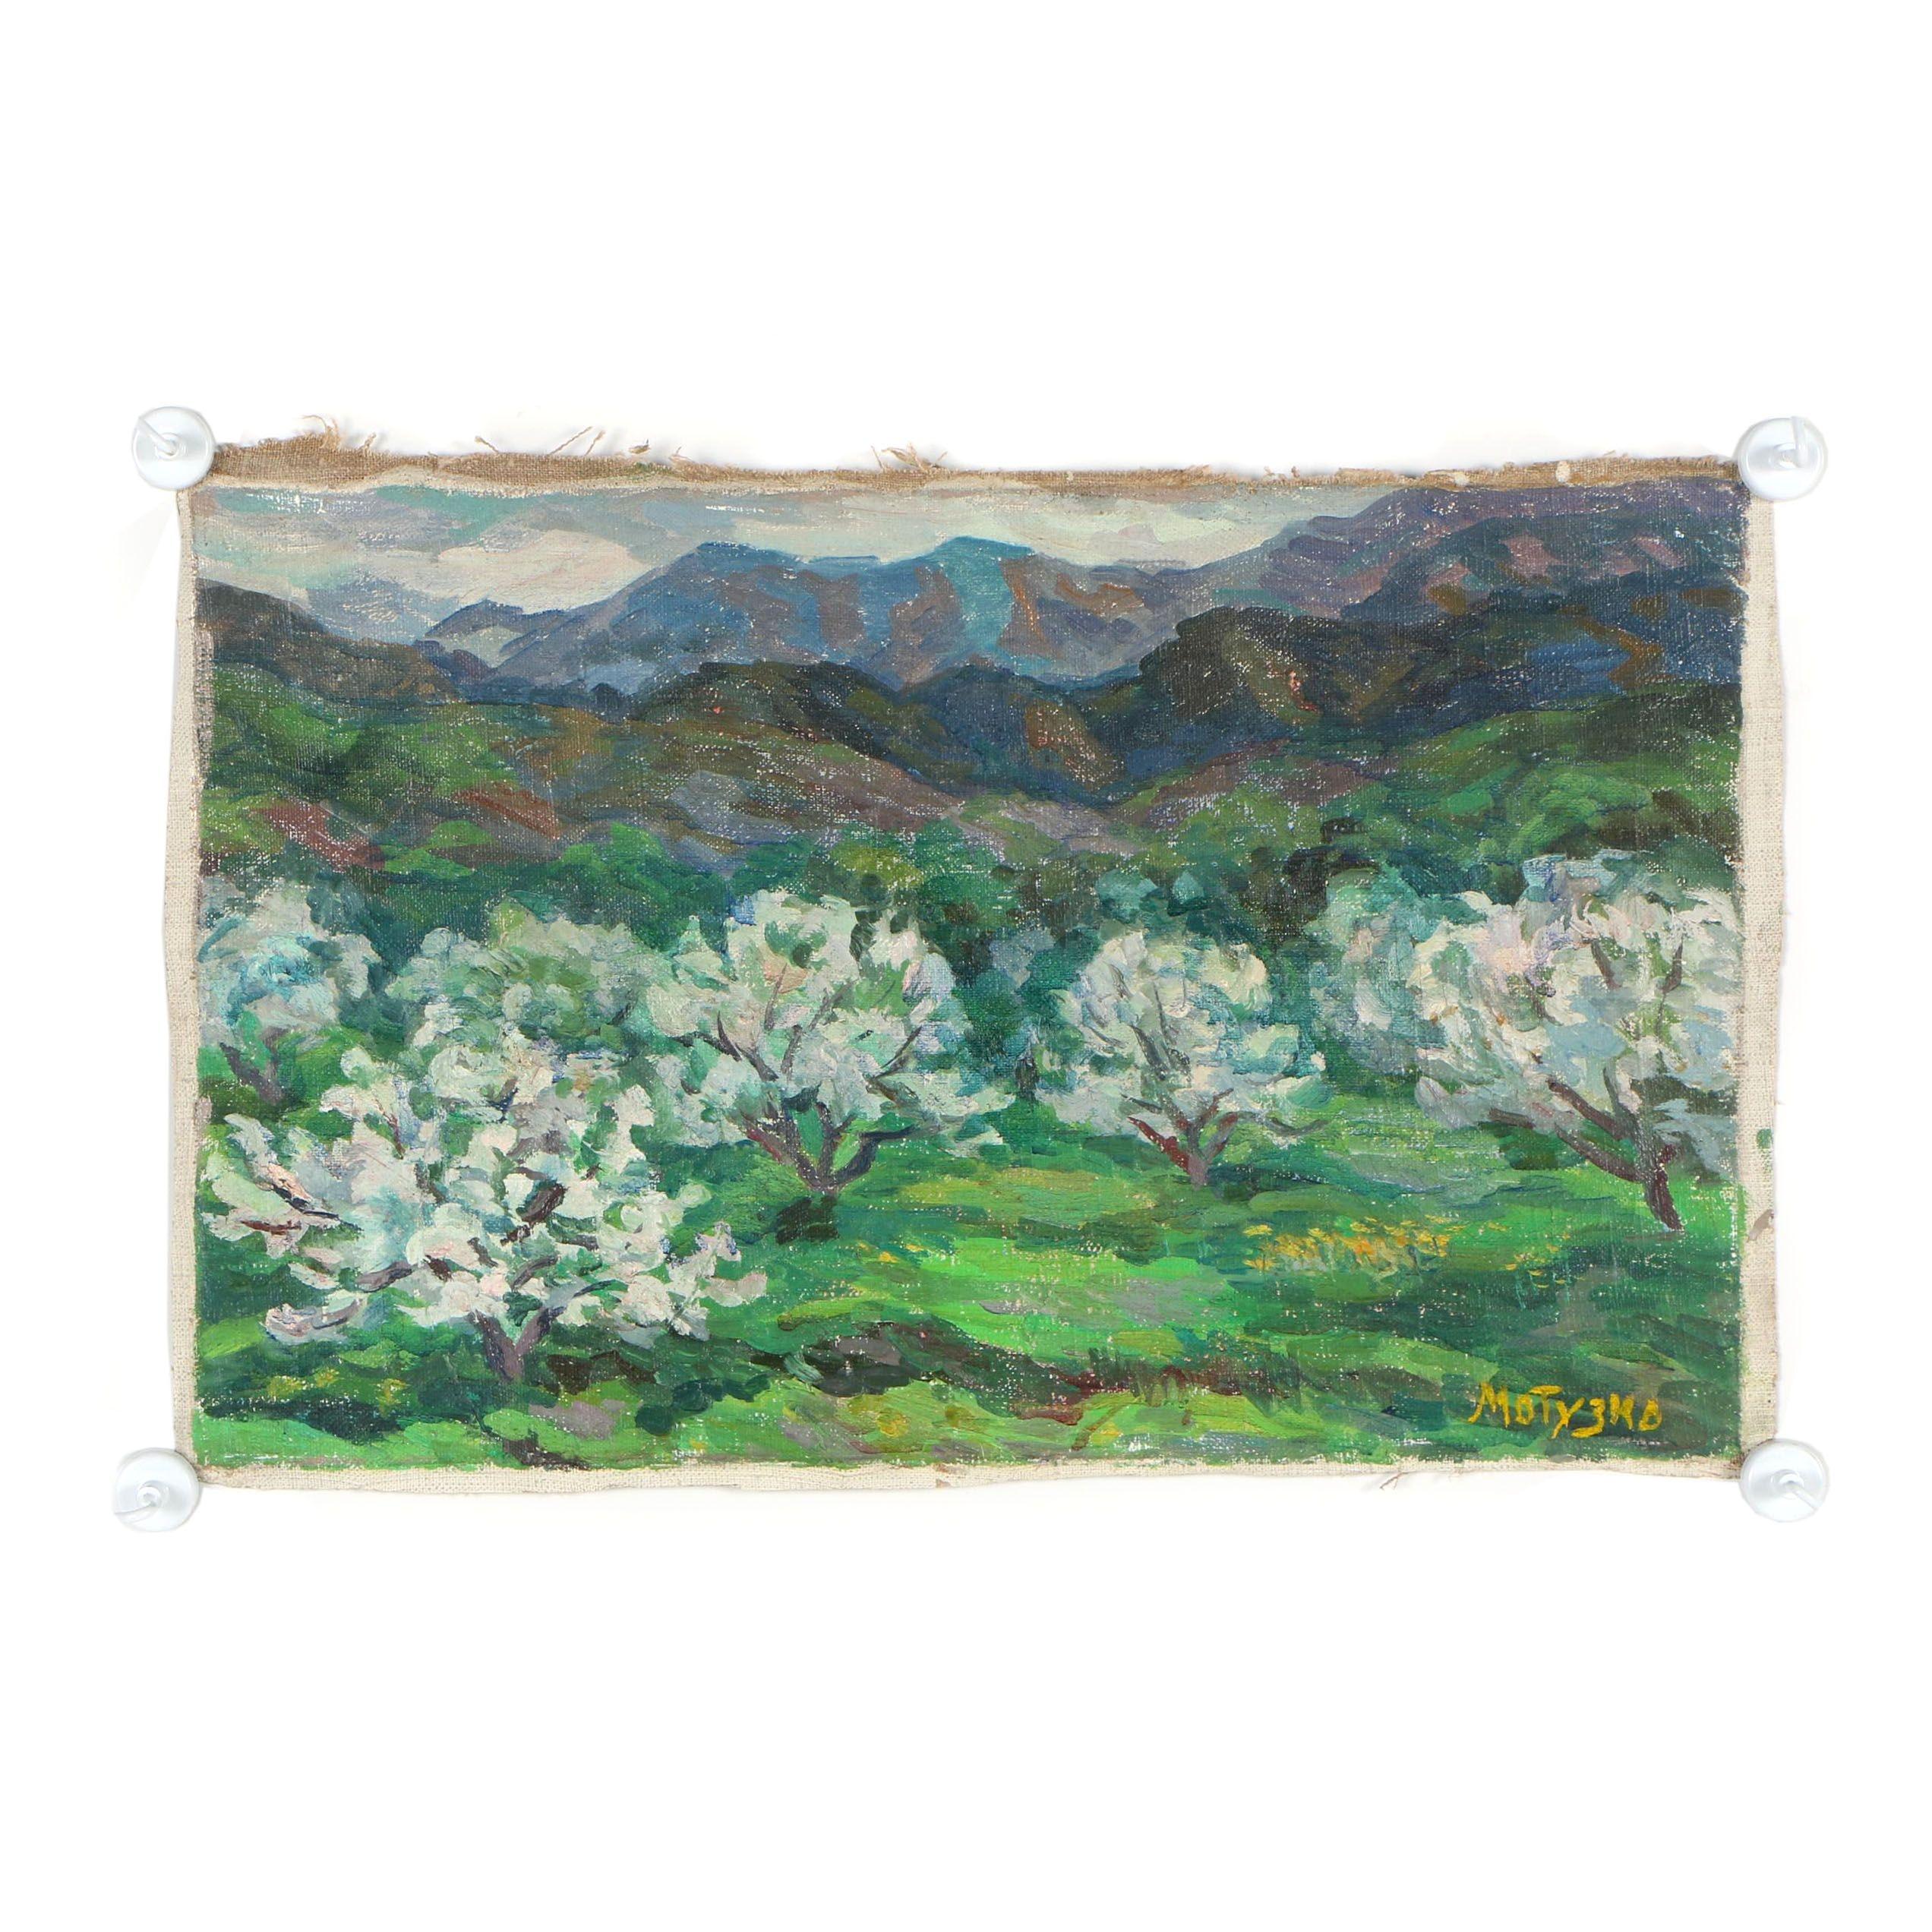 Motuzko Landscape Oil Painting, Late 20th Century